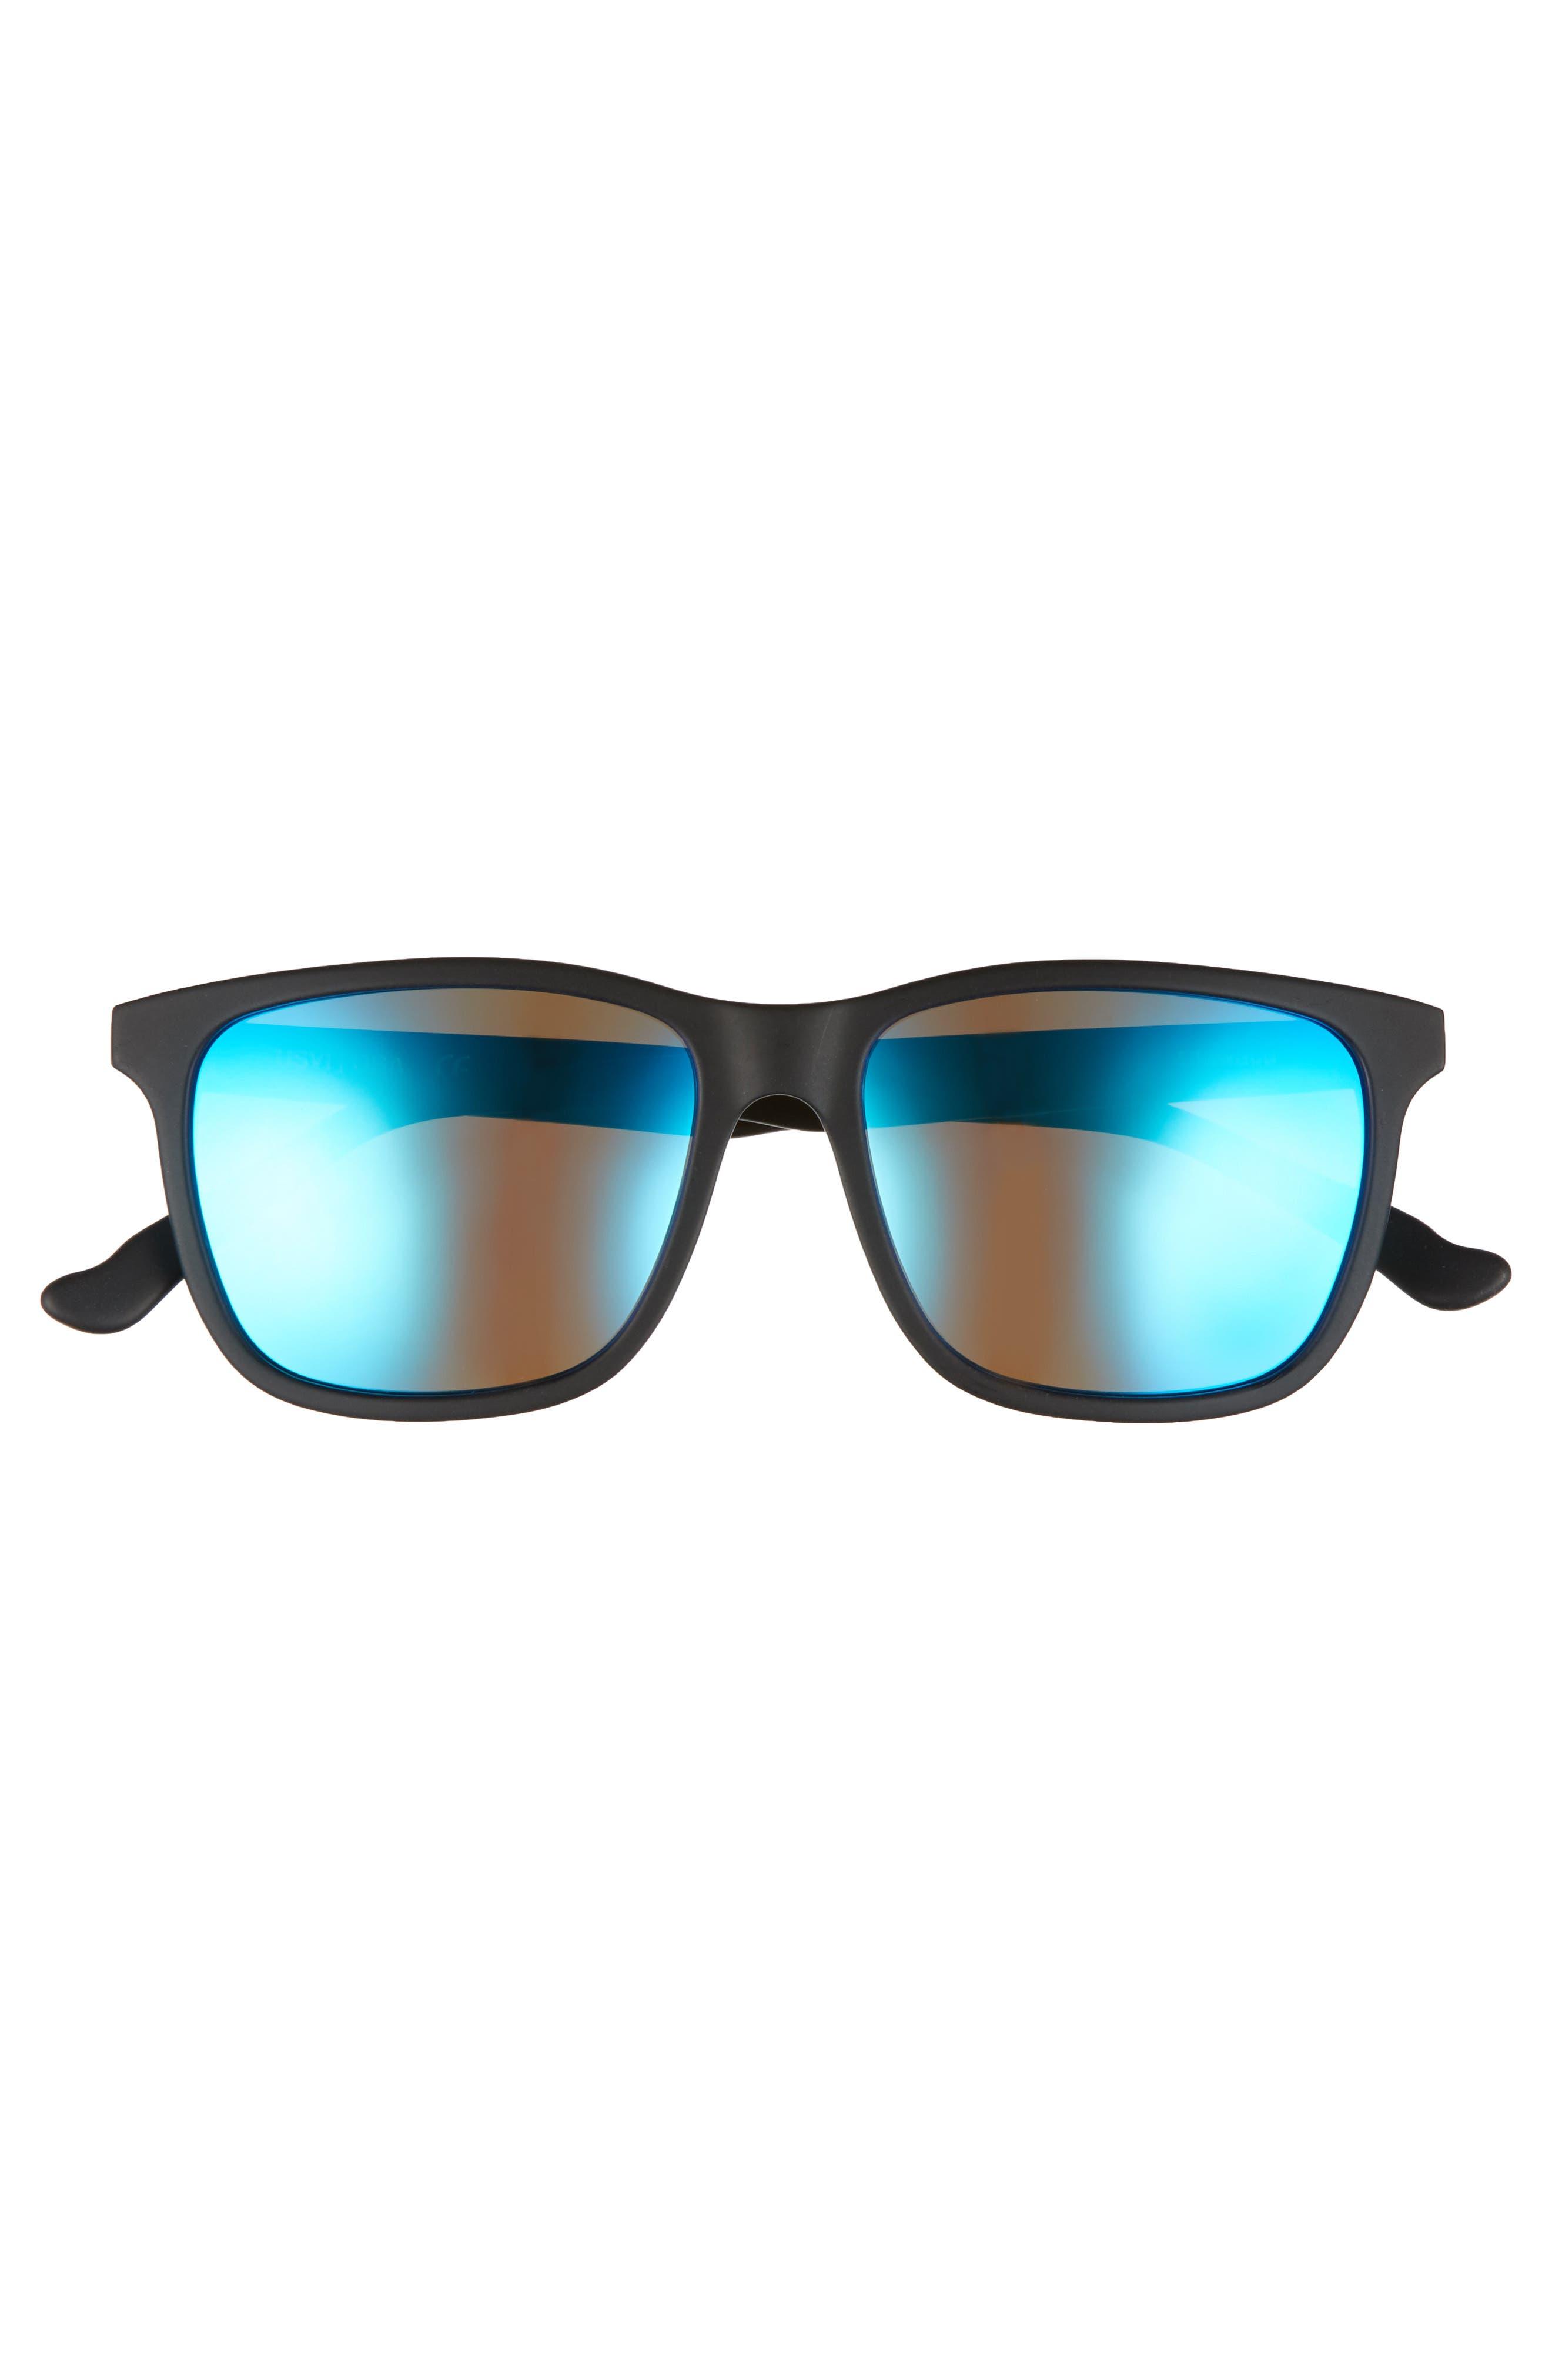 Uluwatu 52mm Polarized Sunglasses,                             Alternate thumbnail 3, color,                             020